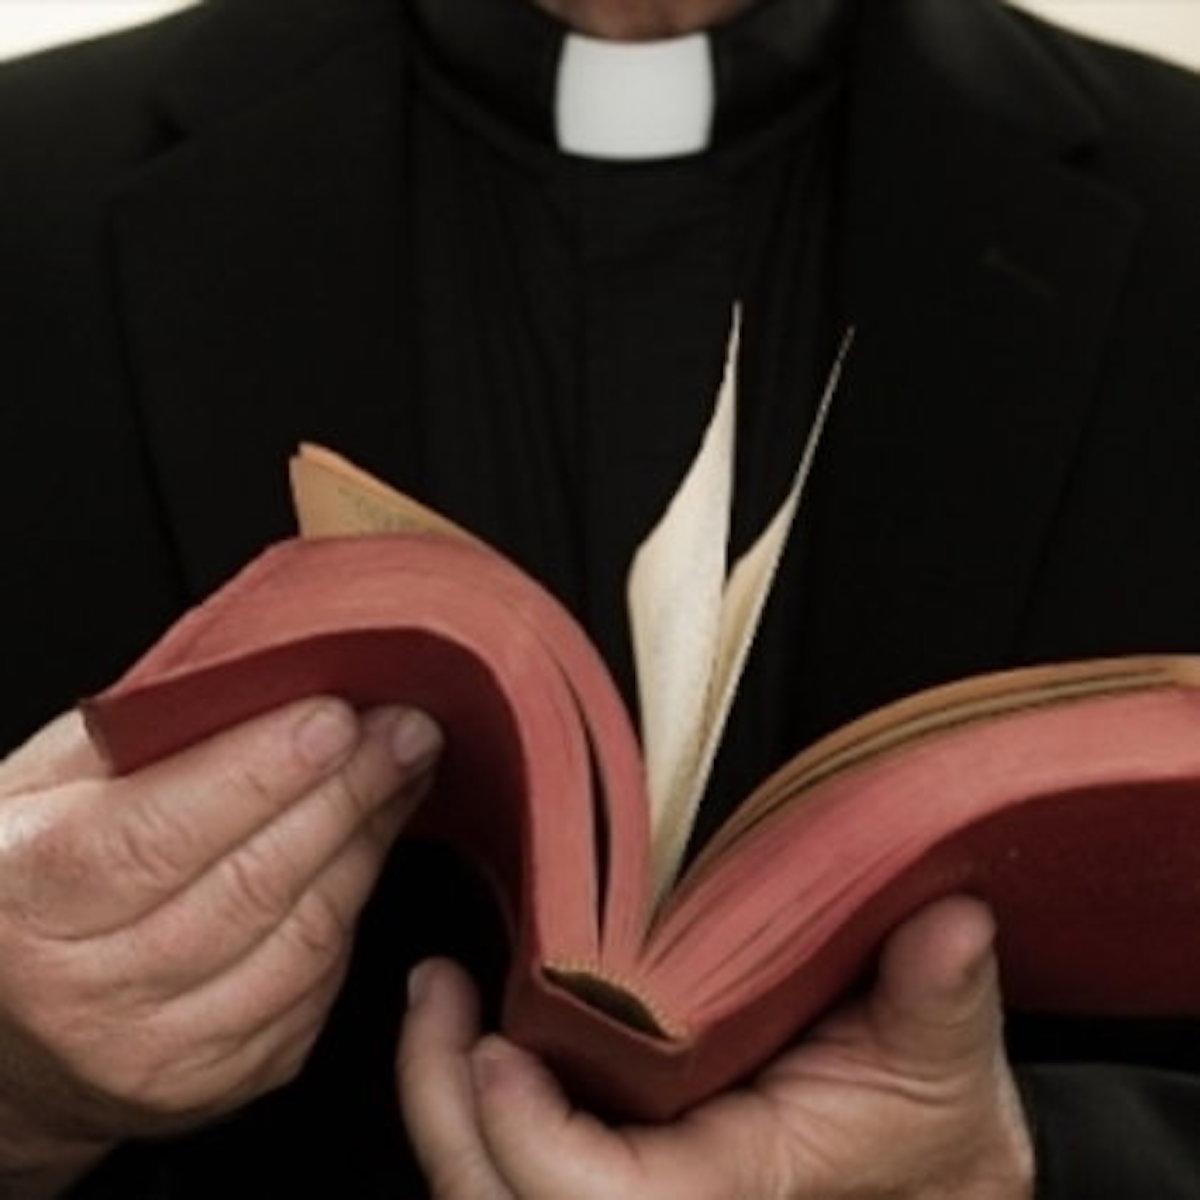 don francesco Spagnesi prete arrestato droga sieropositivo